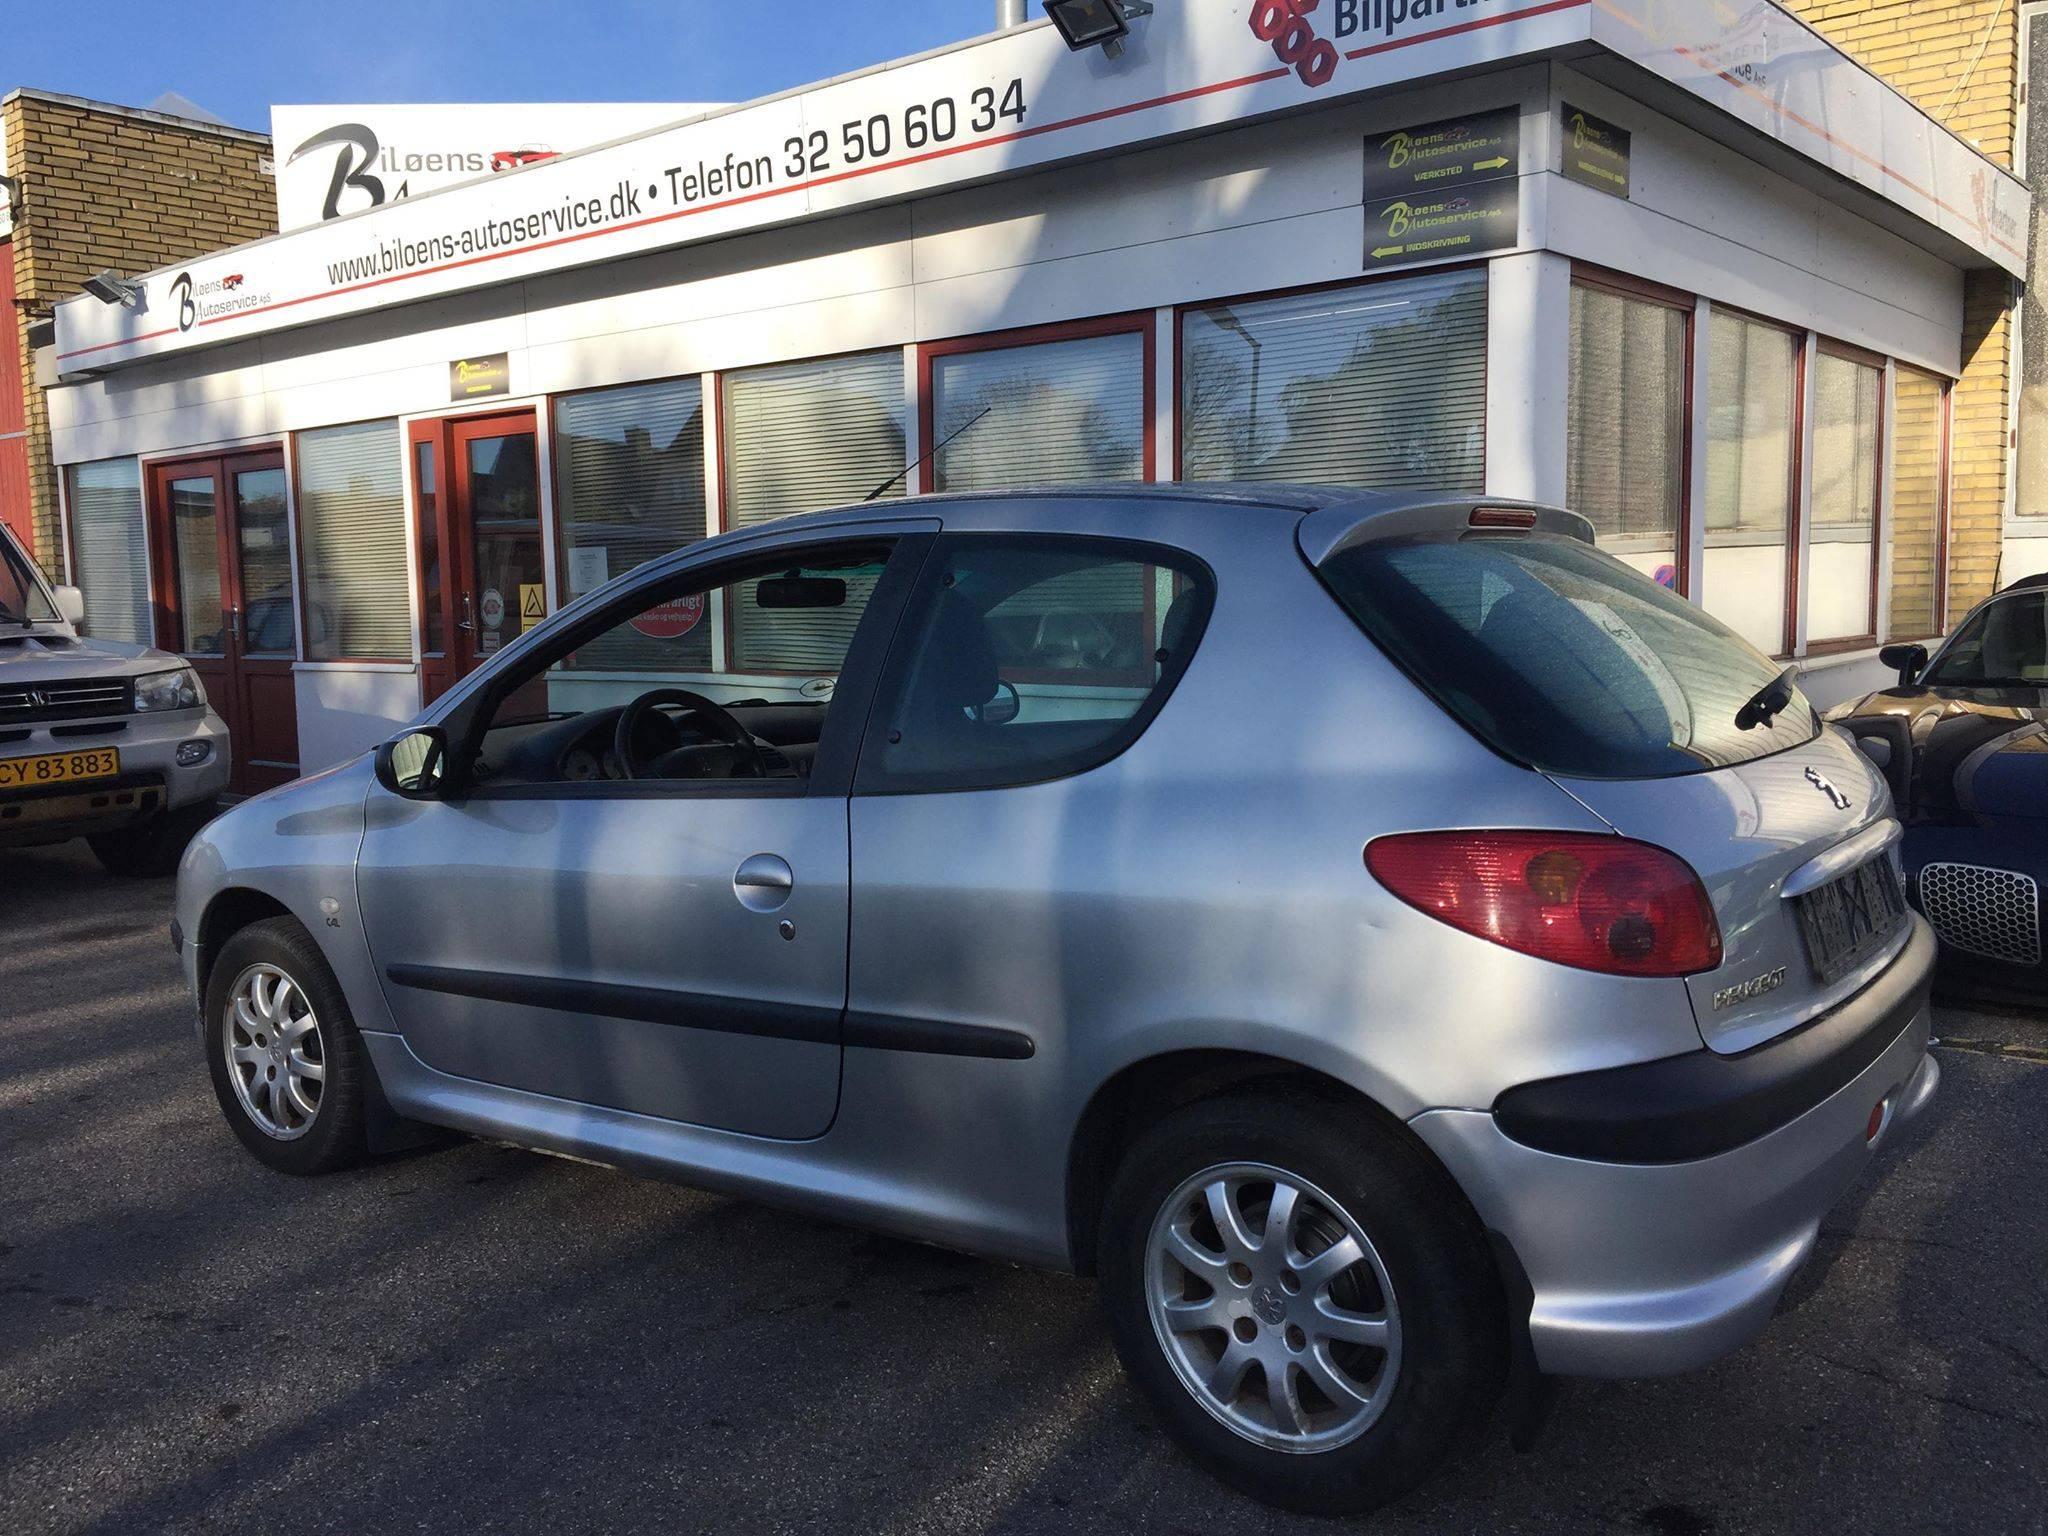 bil til salg